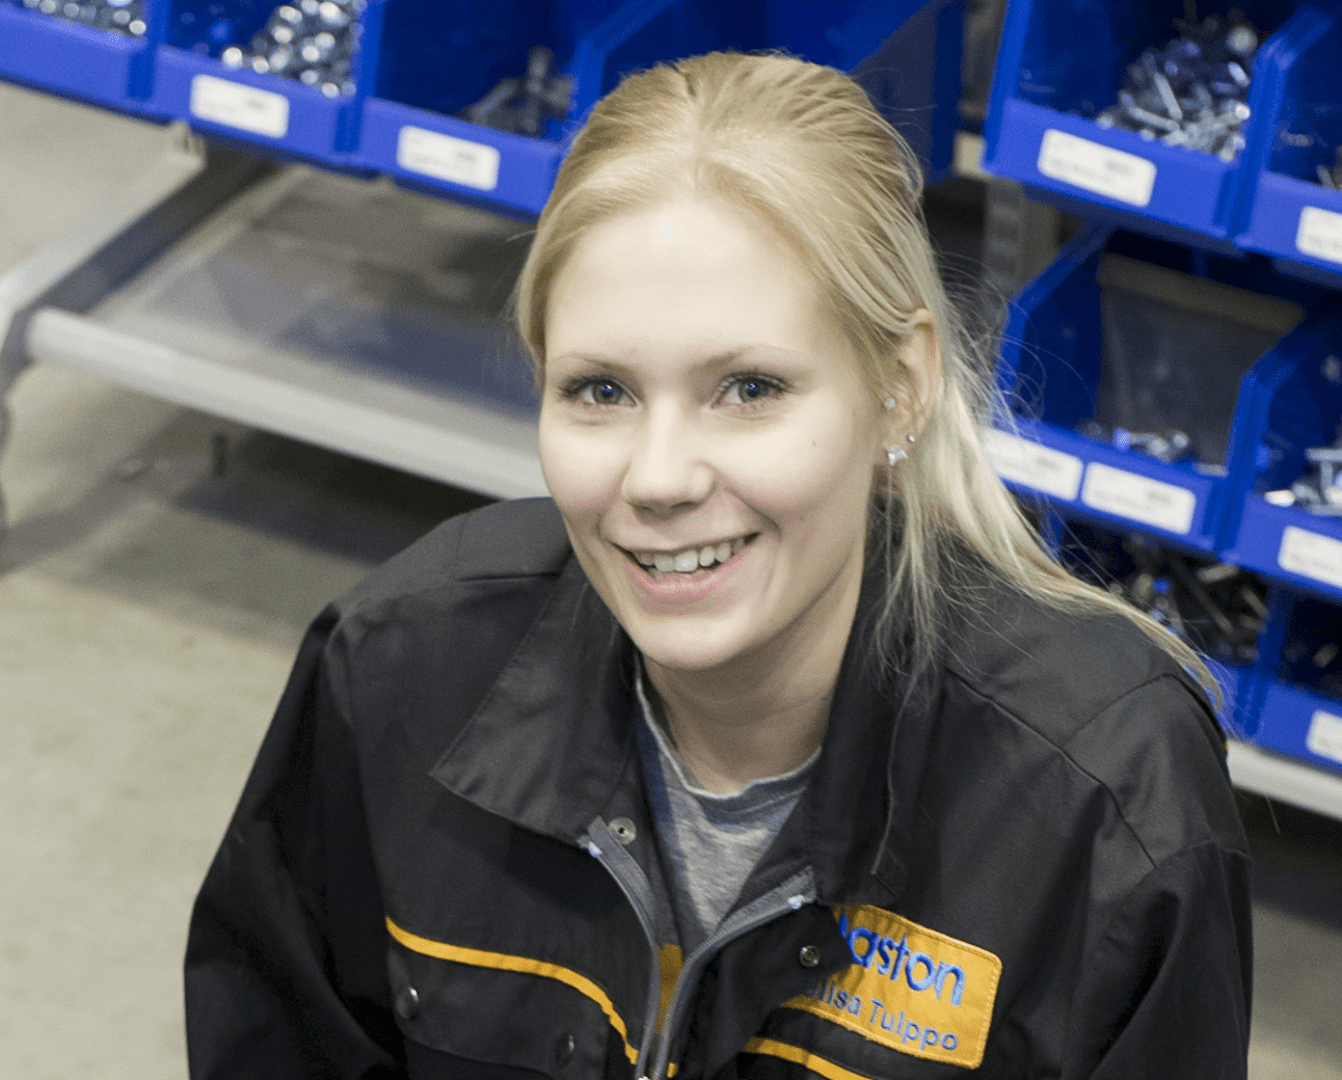 Melisa Tulppo working at Glaston Finland